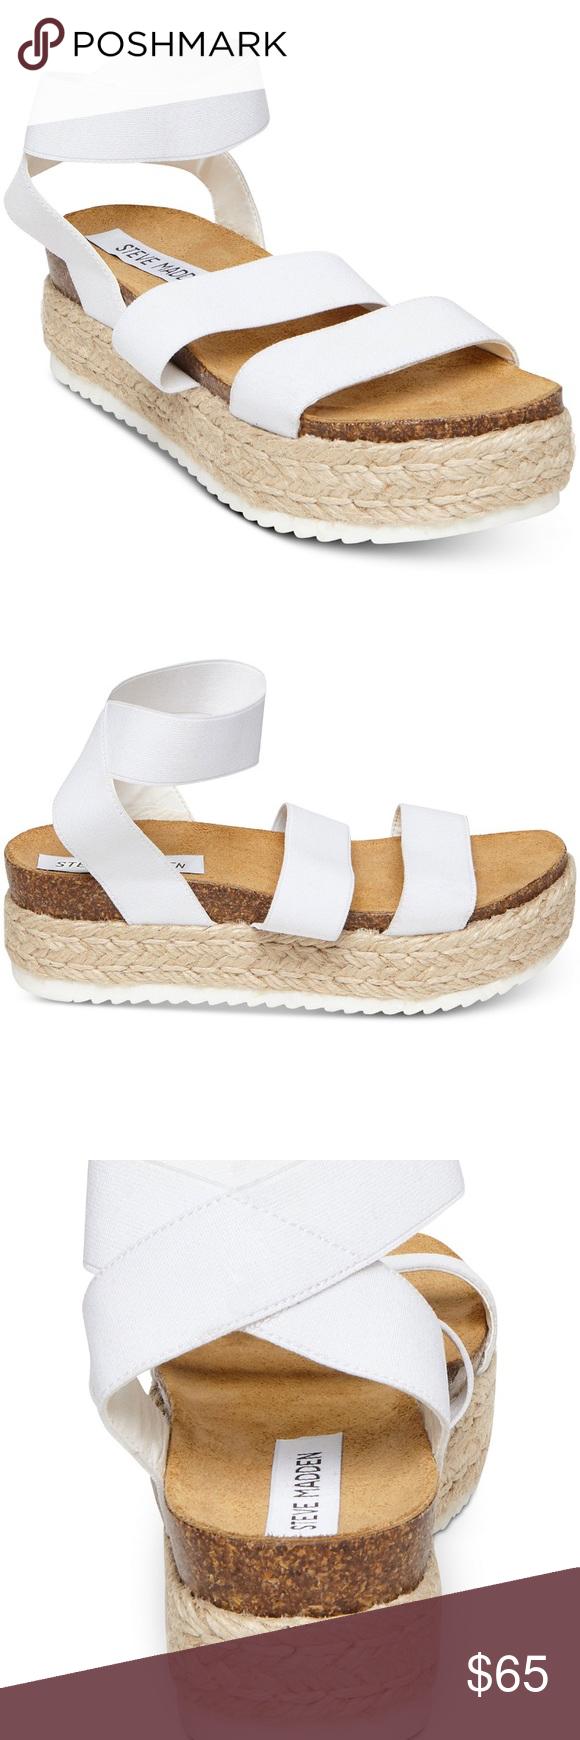 feee720b9bf Steve Madden Kimmie Flatform Espadrille Sandals *PRICE IS FIRM* 2 ...